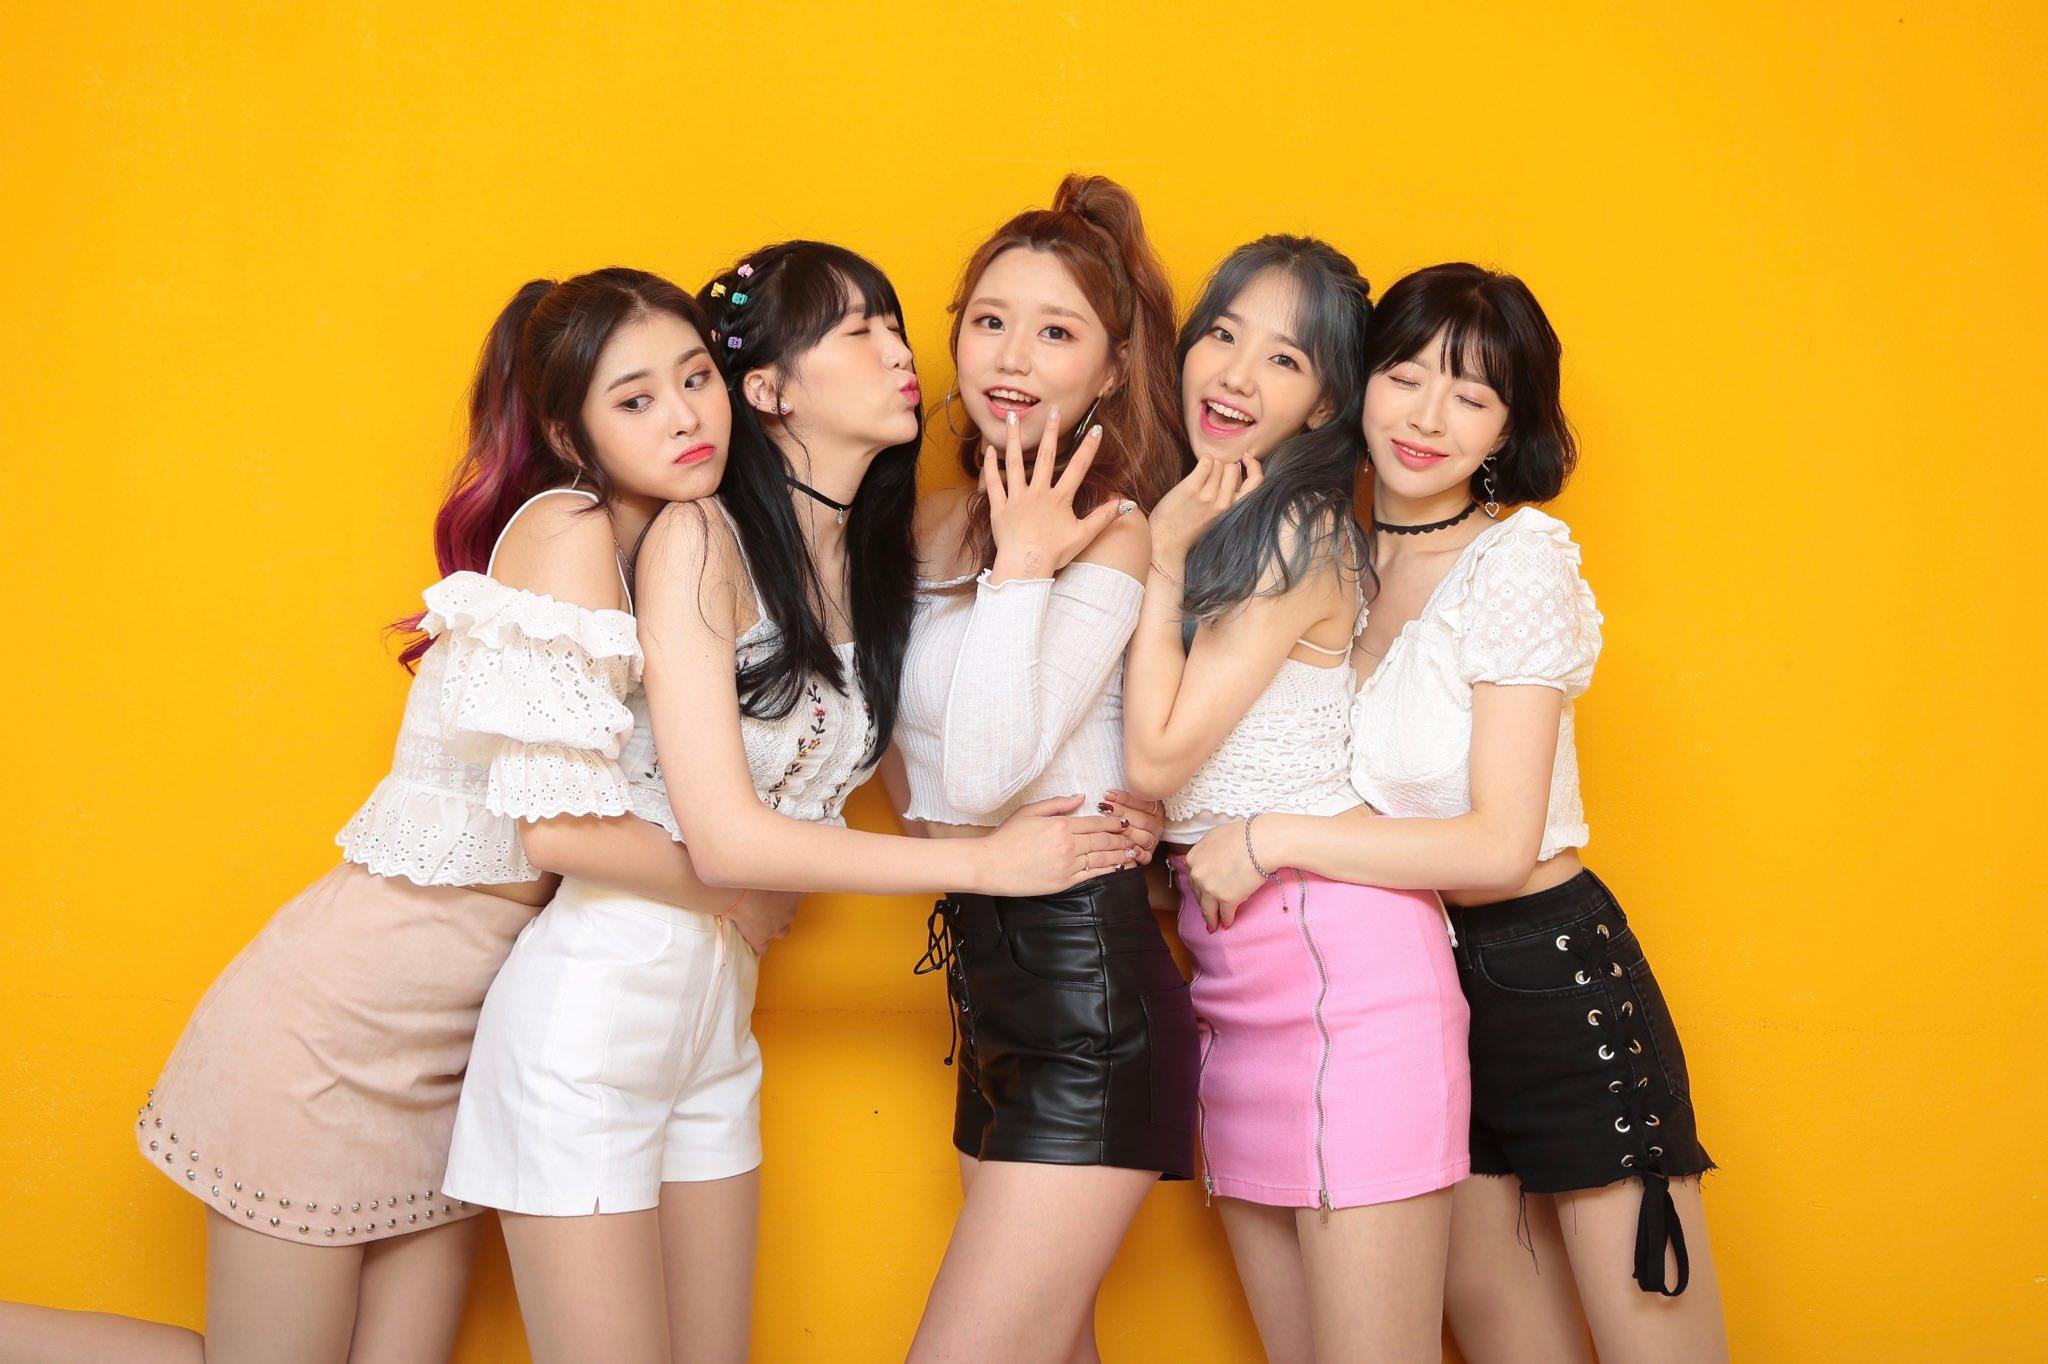 5-k-pop-groups-unfortunately-disbanded-in-2020-3